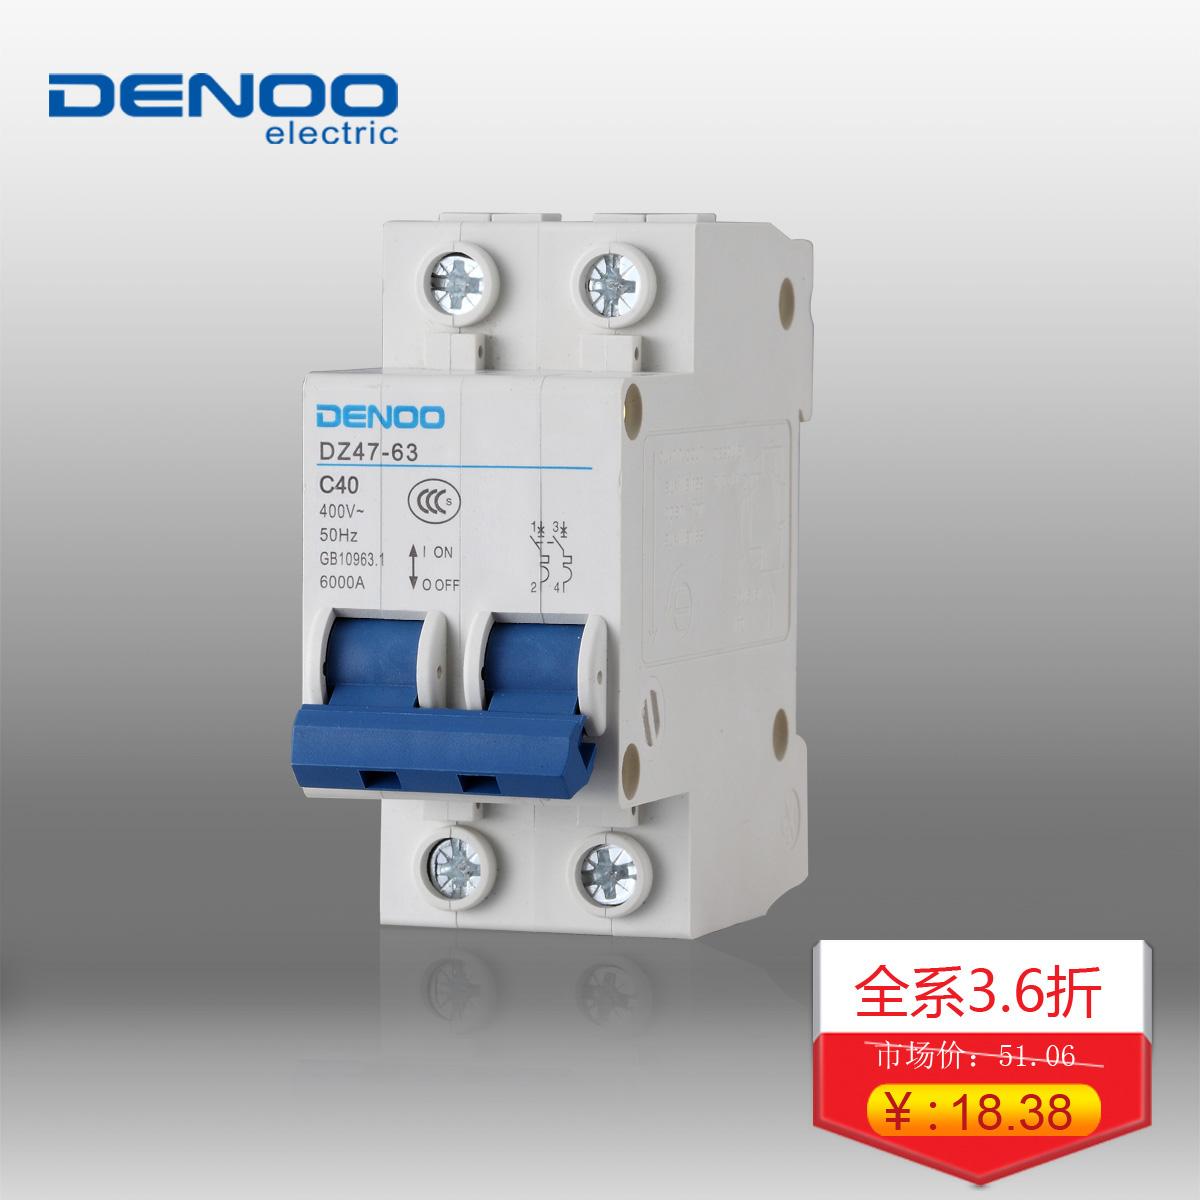 china breakers circuit breaker, china breakers circuit breakerget quotations · dan long miniature circuit breakers open space home dz47 2p 63 c40 air switch